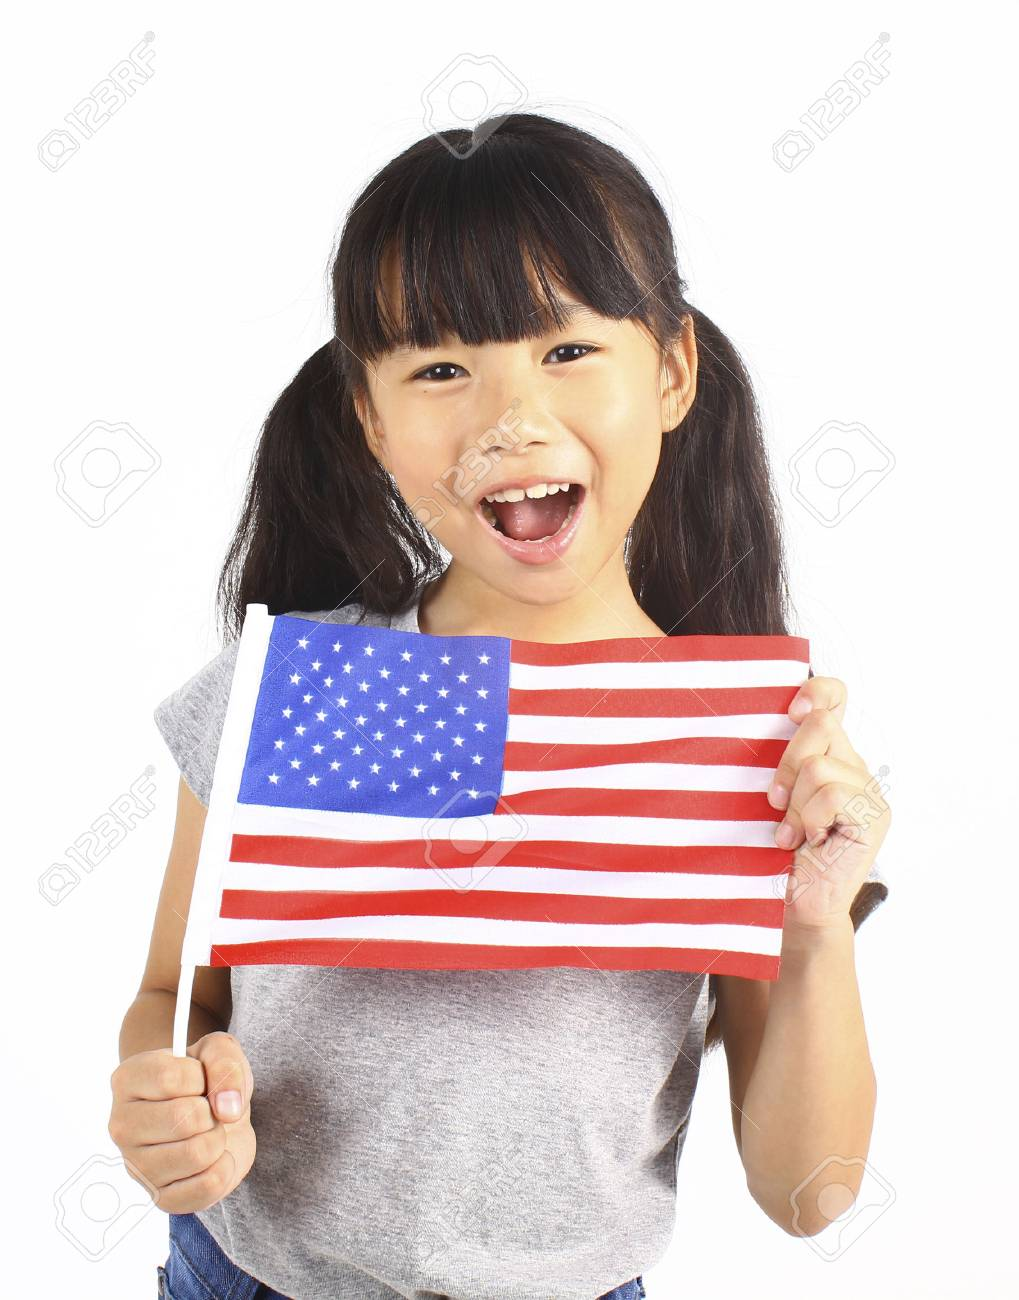 Cute girl holding an American Flag - 52379974